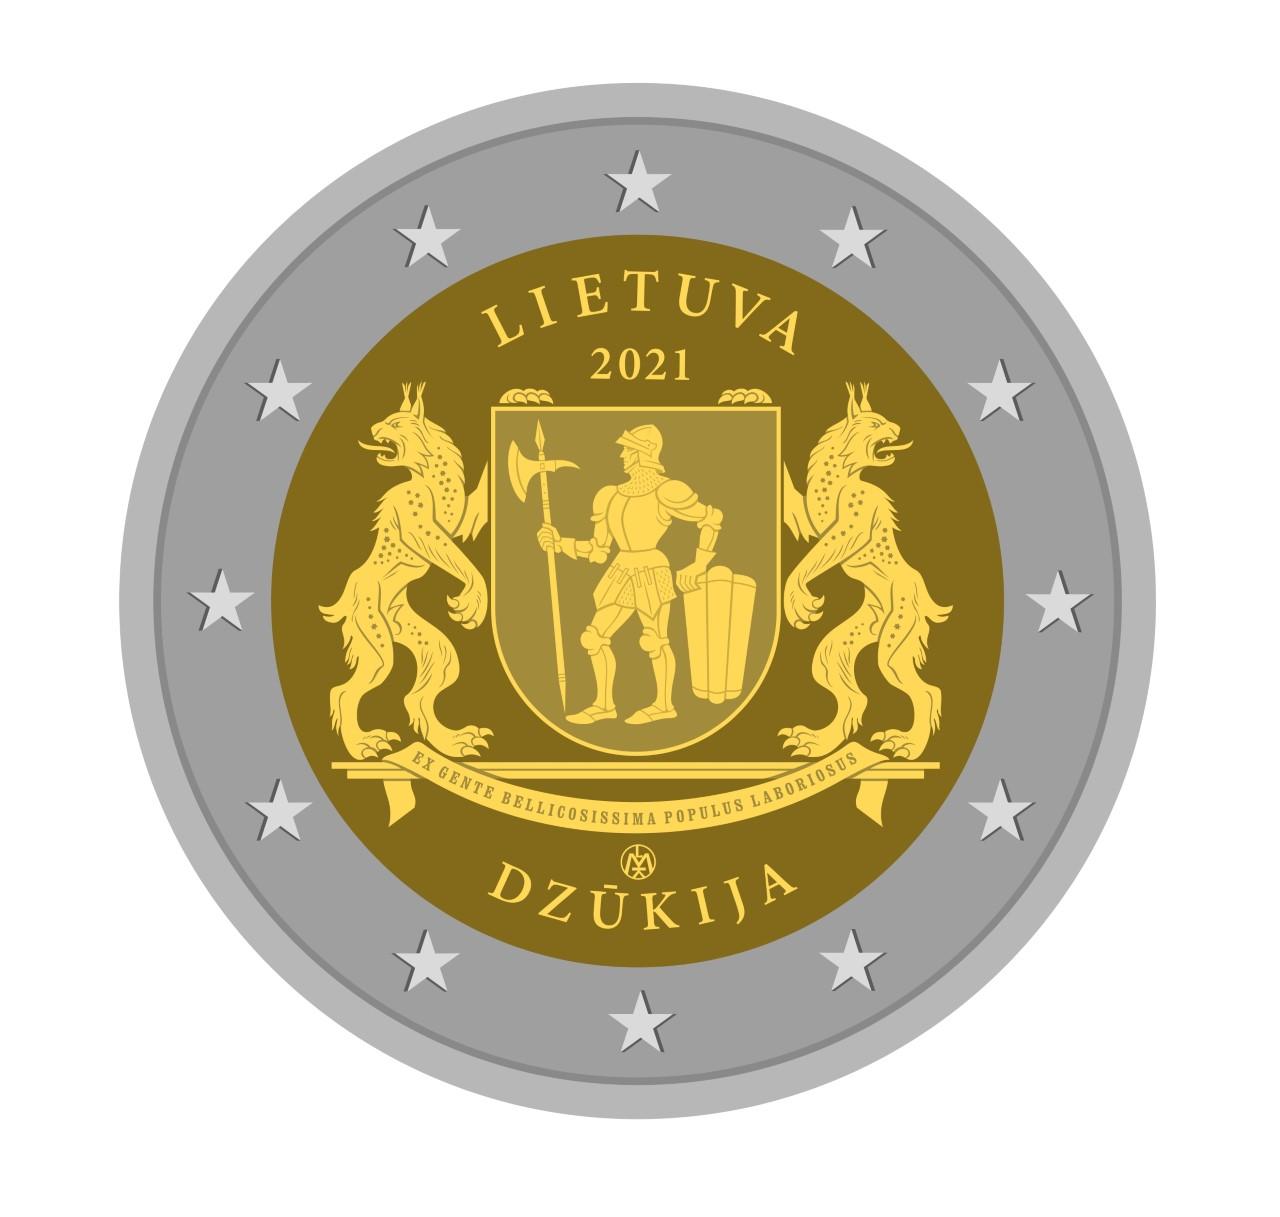 Artist Rolandas RIMKUNAS about DZUKIJA €2 commemorative coin genesis